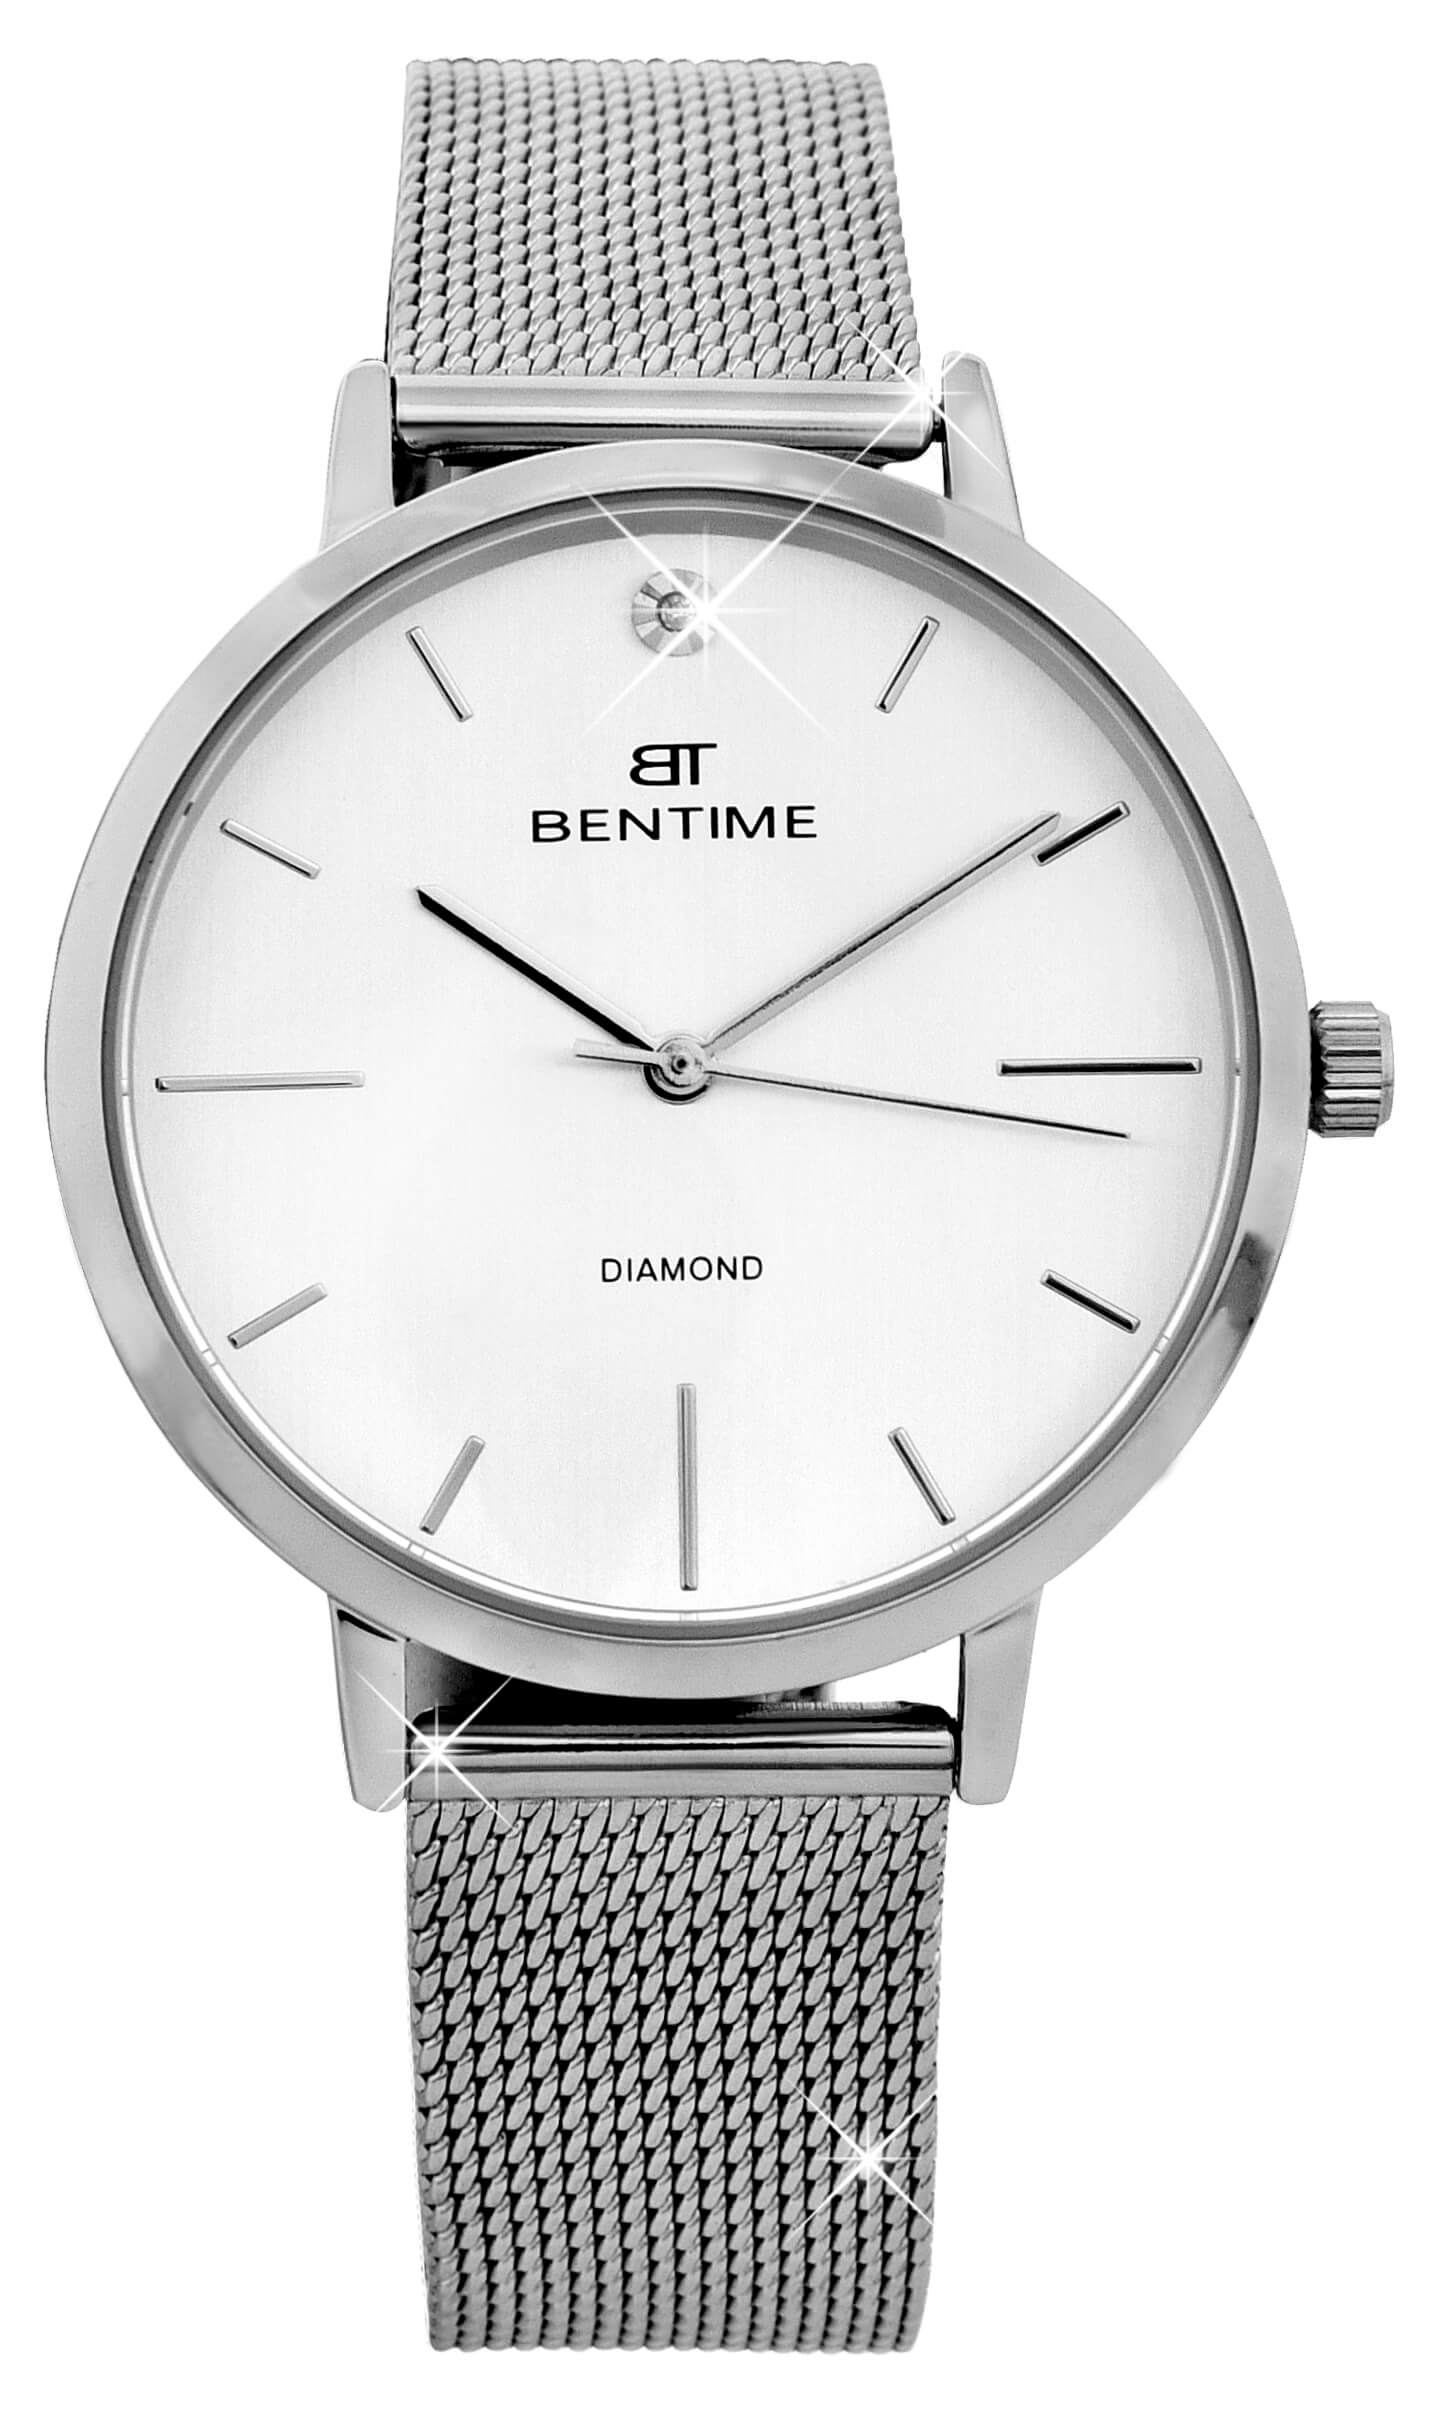 Bentime Dámské hodinky s diamantom 027-9MB-PT11894M  17d5dbed017